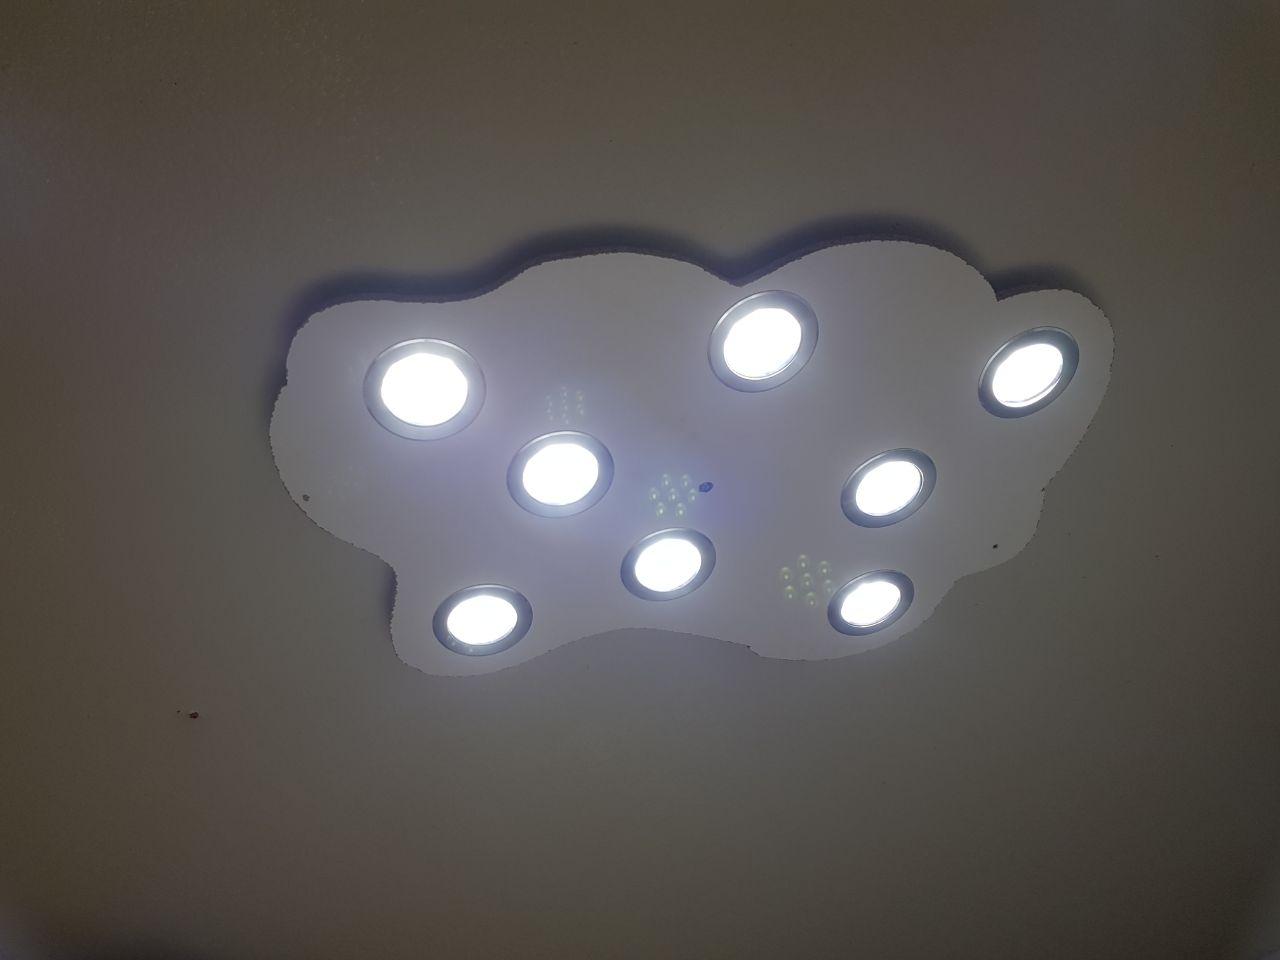 lahr2006 testet: Hengda® 8er 7W LED Spot Einbauleuchte Kaltweiß ...